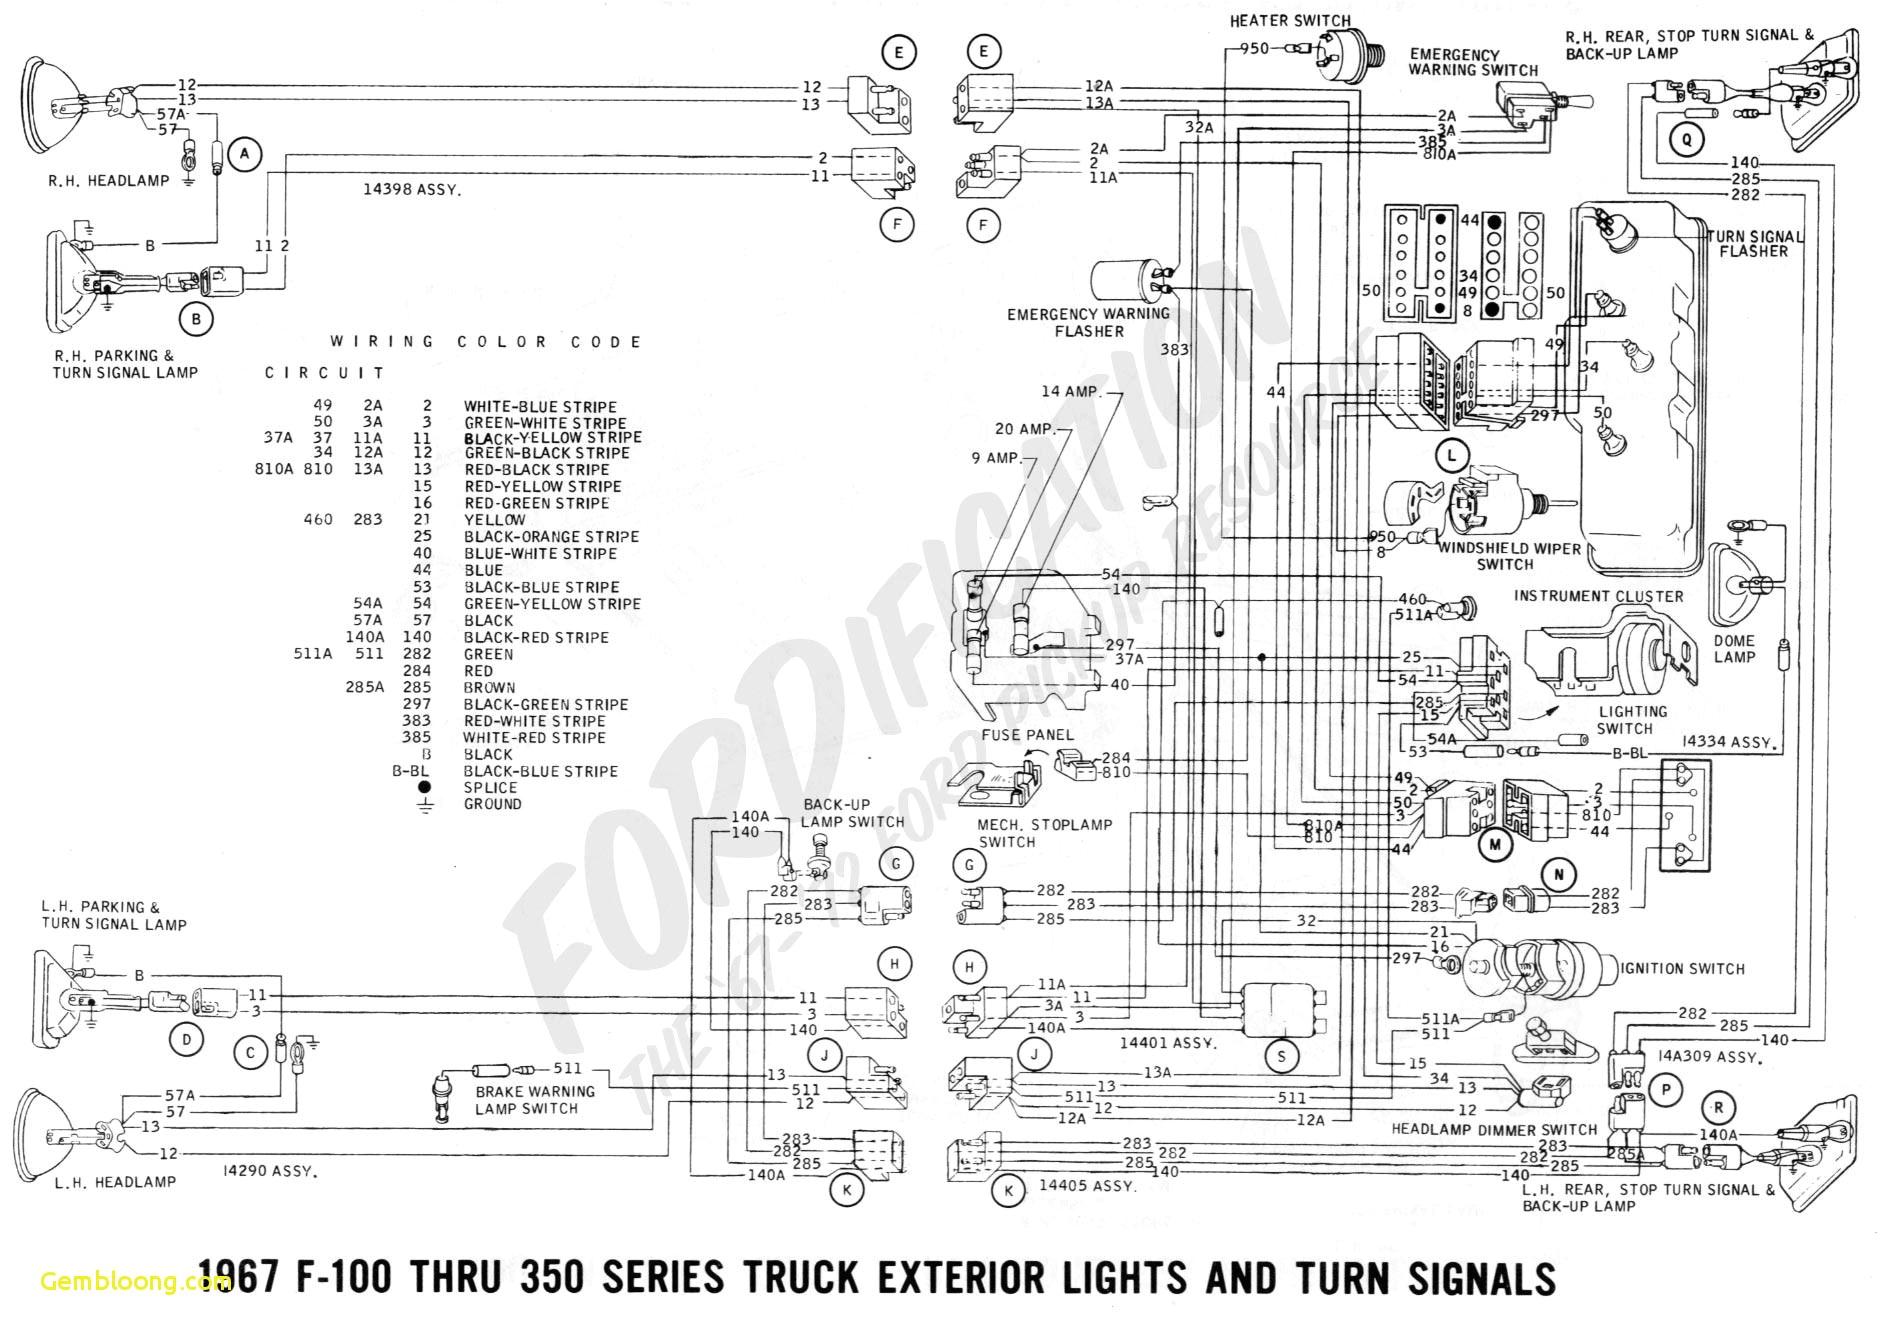 ford truck engine diagram wiring diagram database download ford trucks wiring diagrams ford f150 wiring